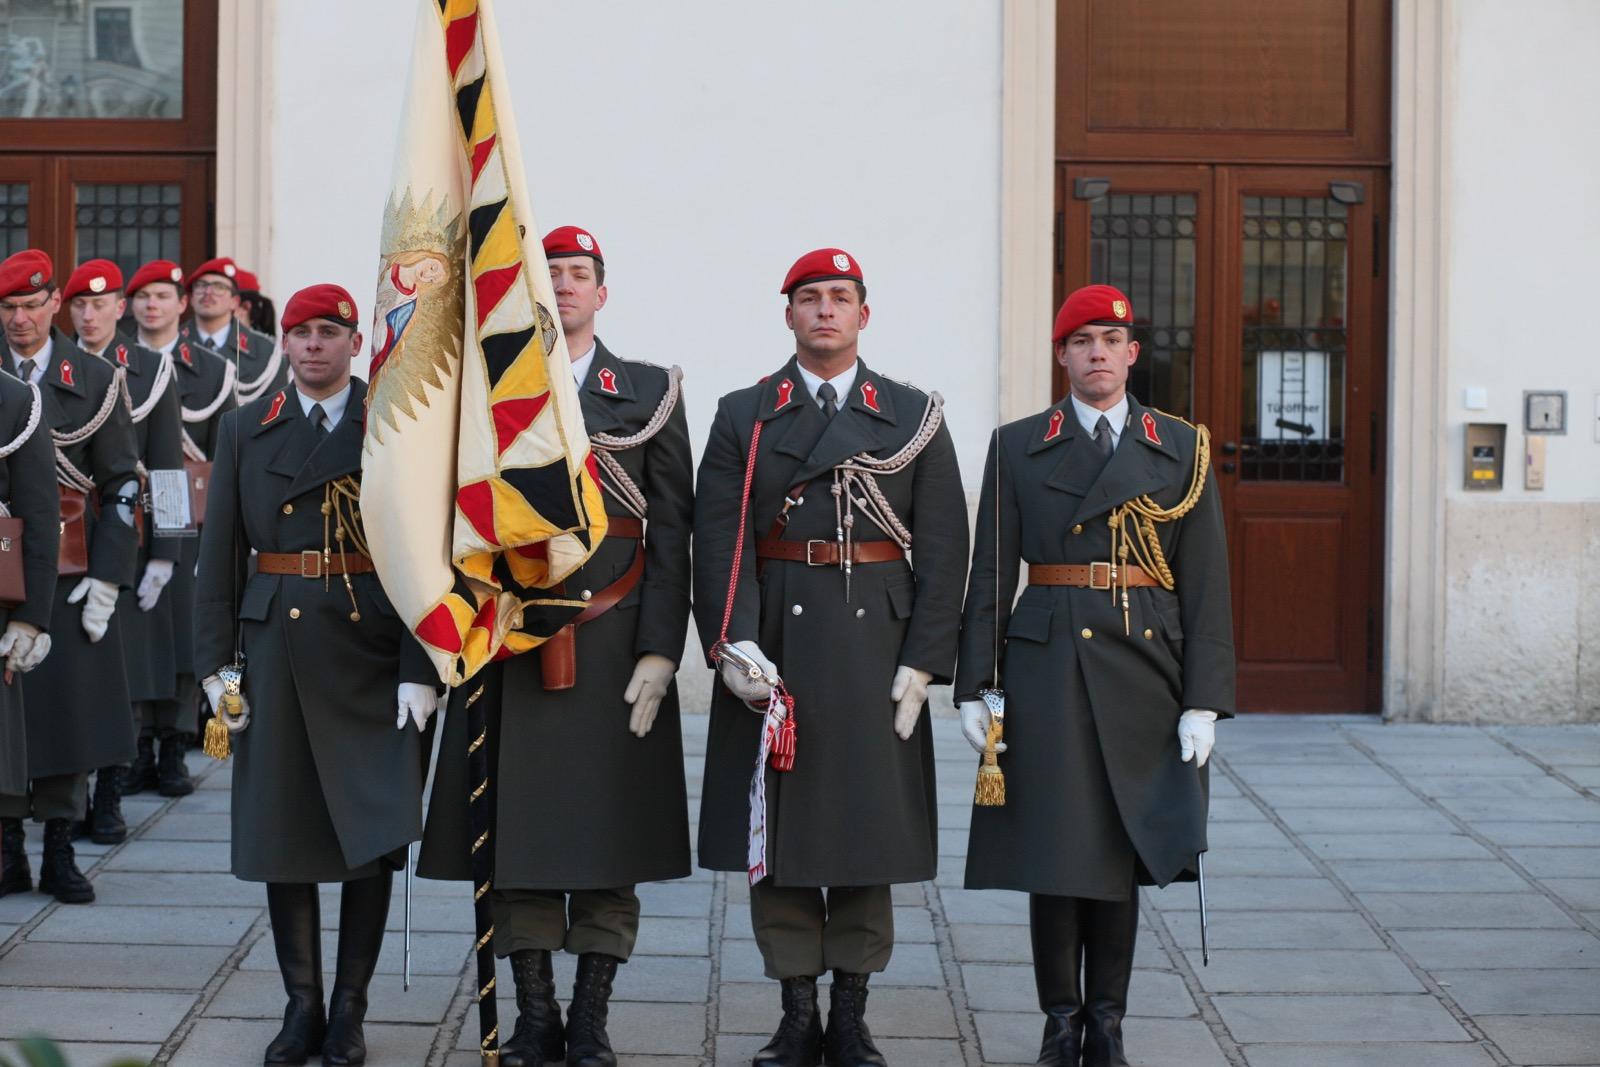 2019_01_11_1Gardekompanie_HBP_SUI_Präsident_Schweiz_Burghof - 2 of 36